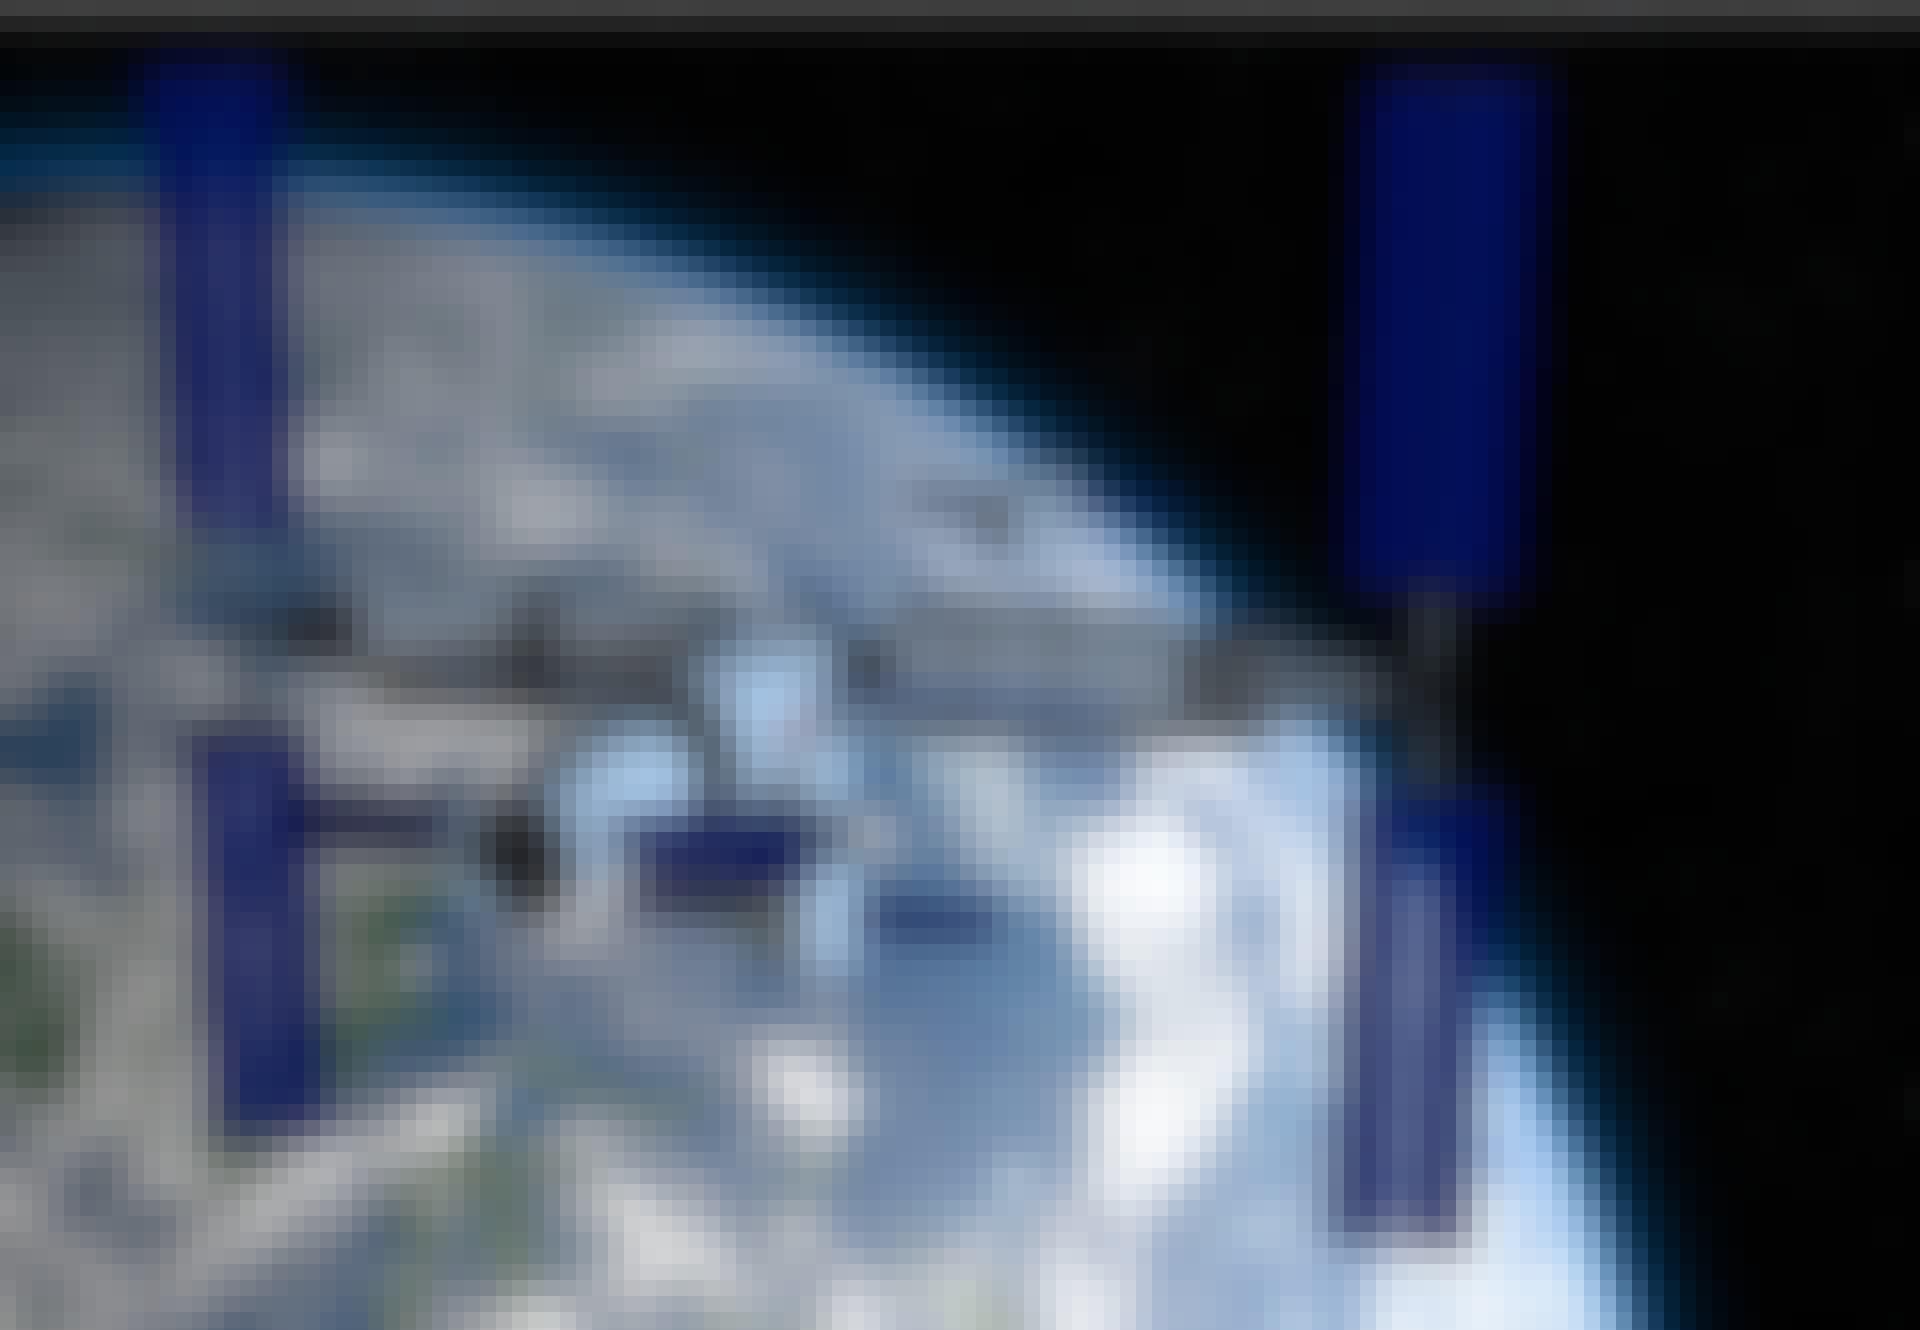 Modell av rymdstationen Tiangong i omloppsbana